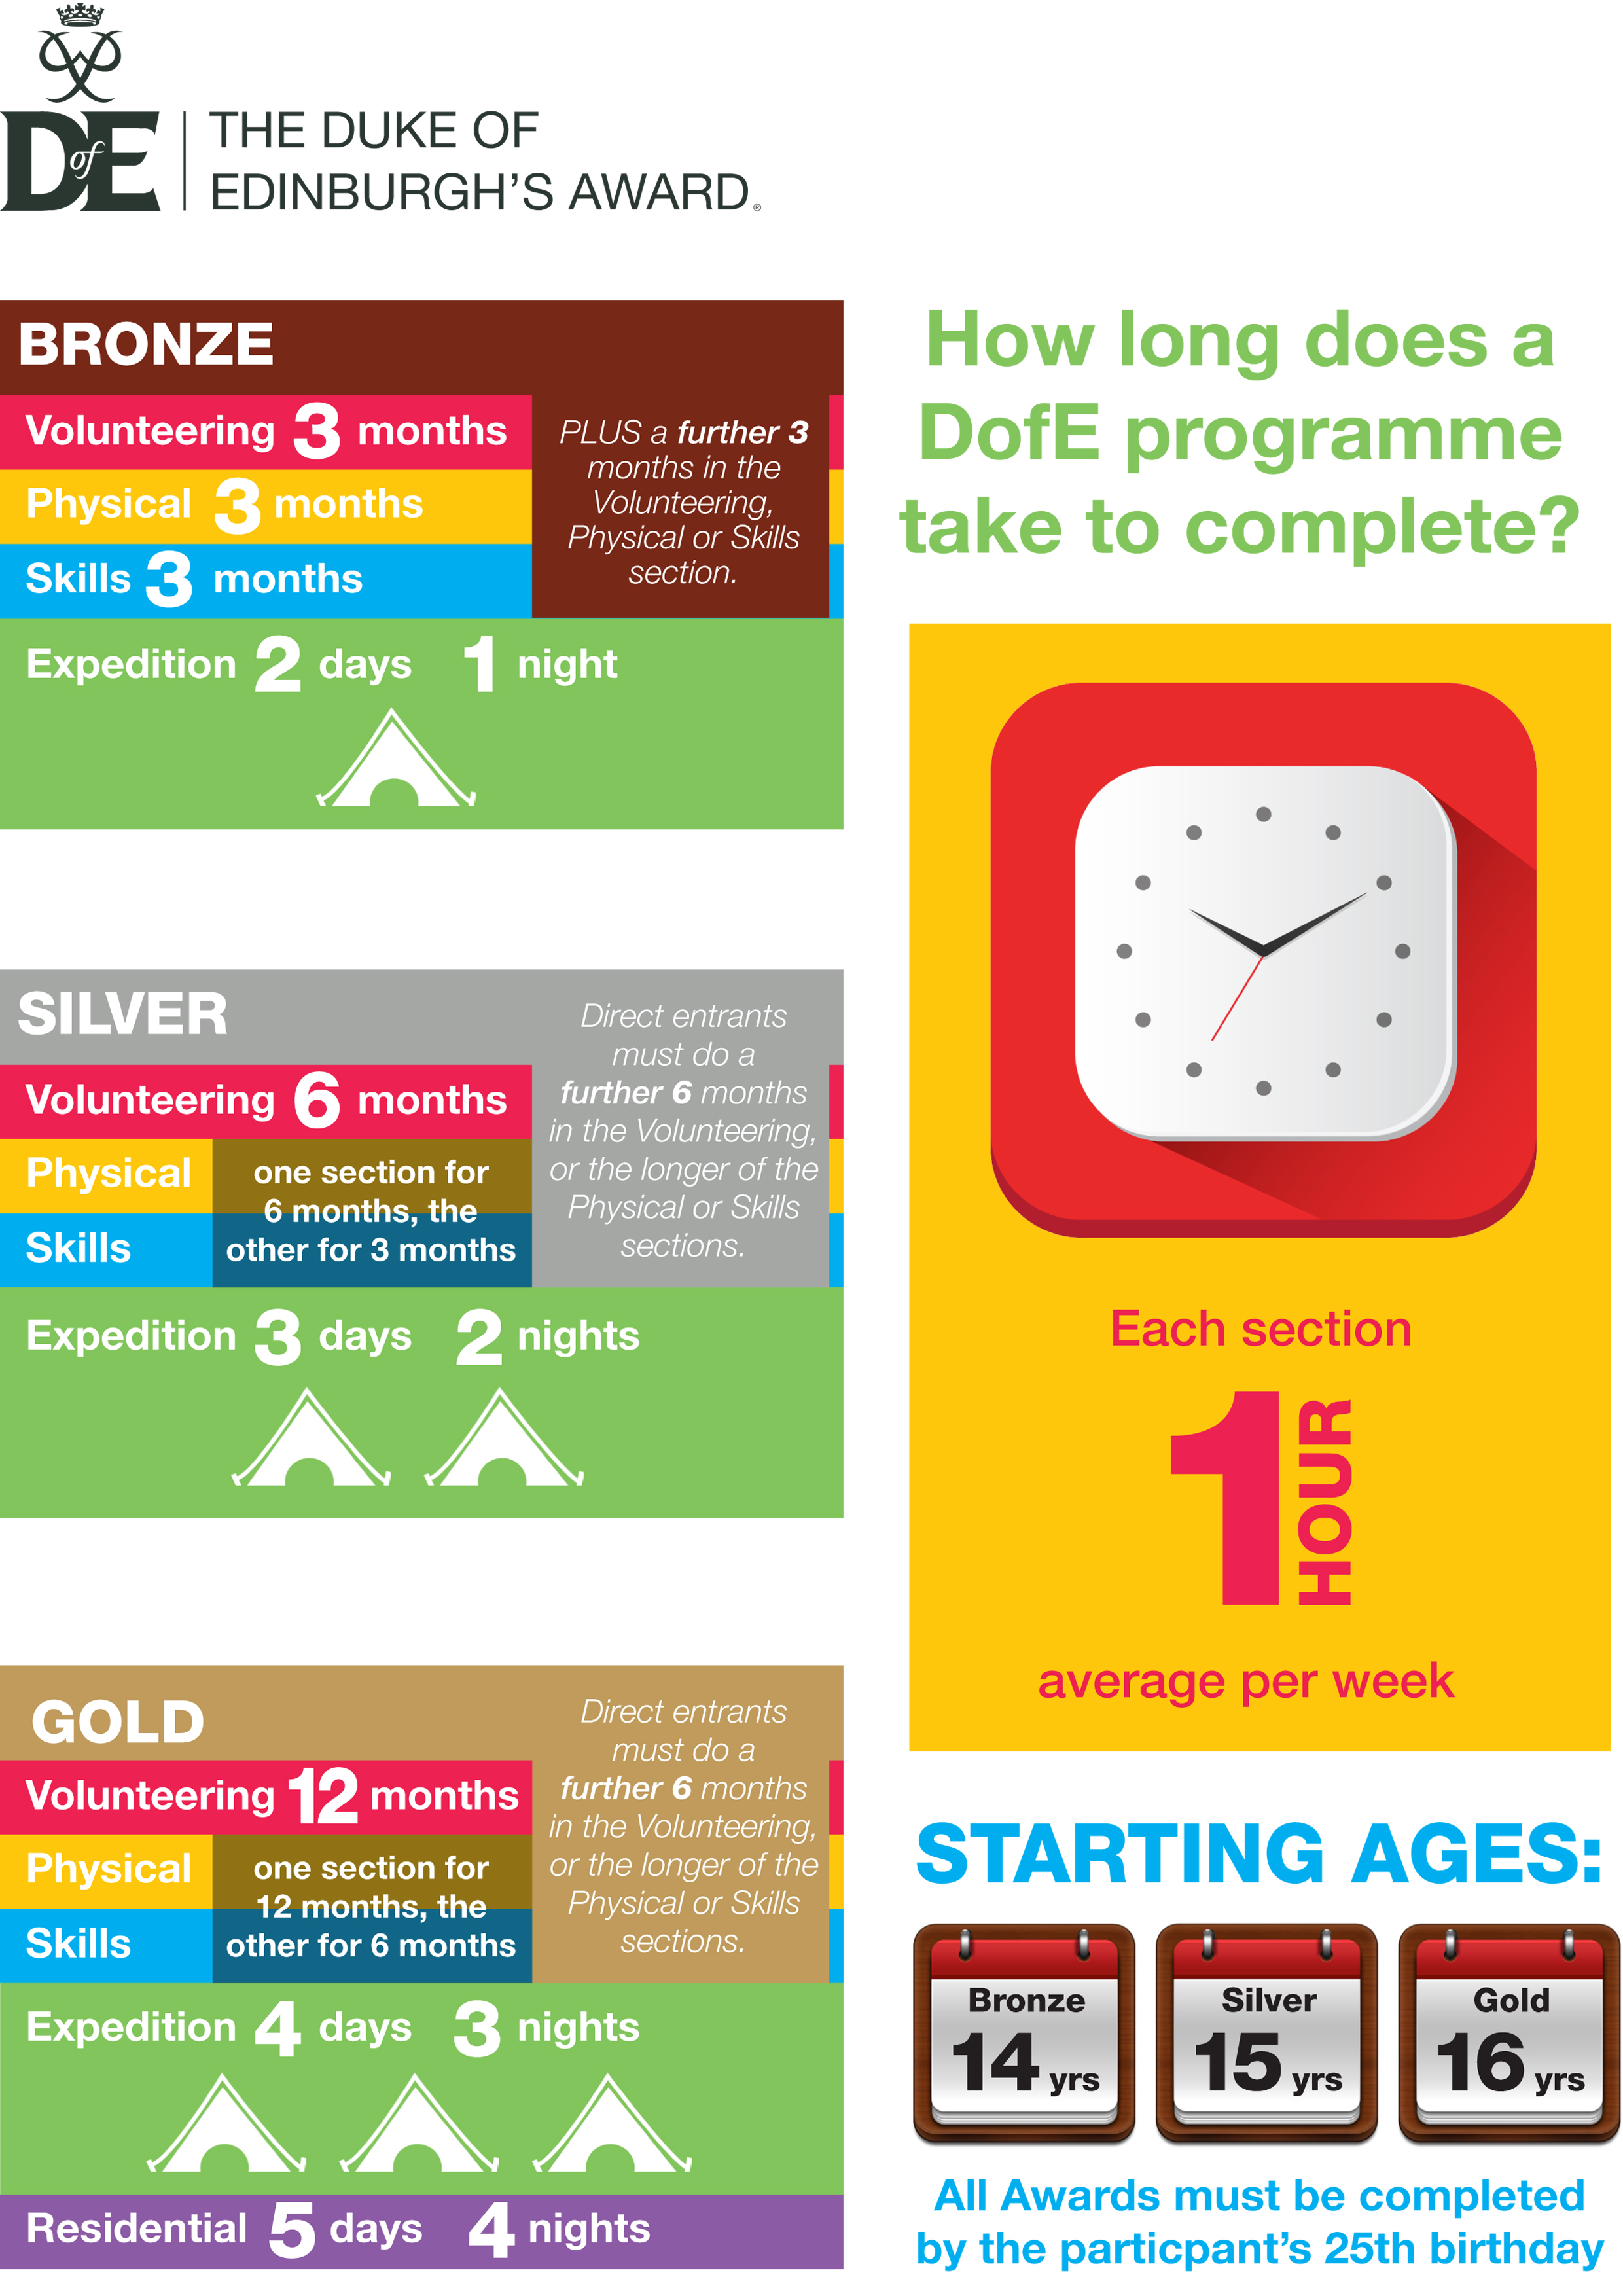 DofE award timescale